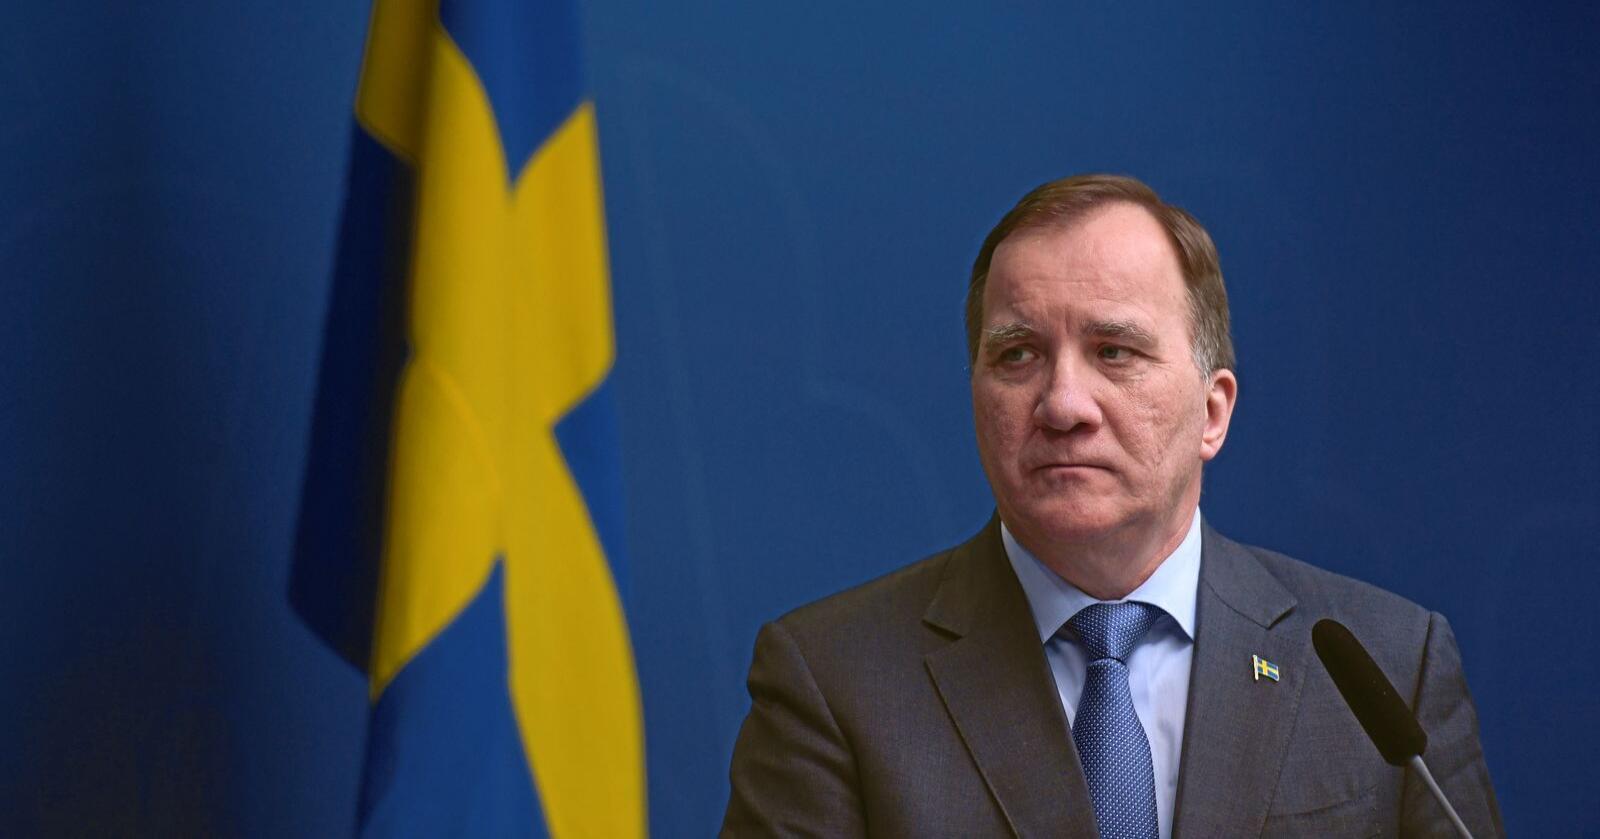 Sveriges statsminister Stefan Löfven. Foto: Erik Simander / TT / NTB